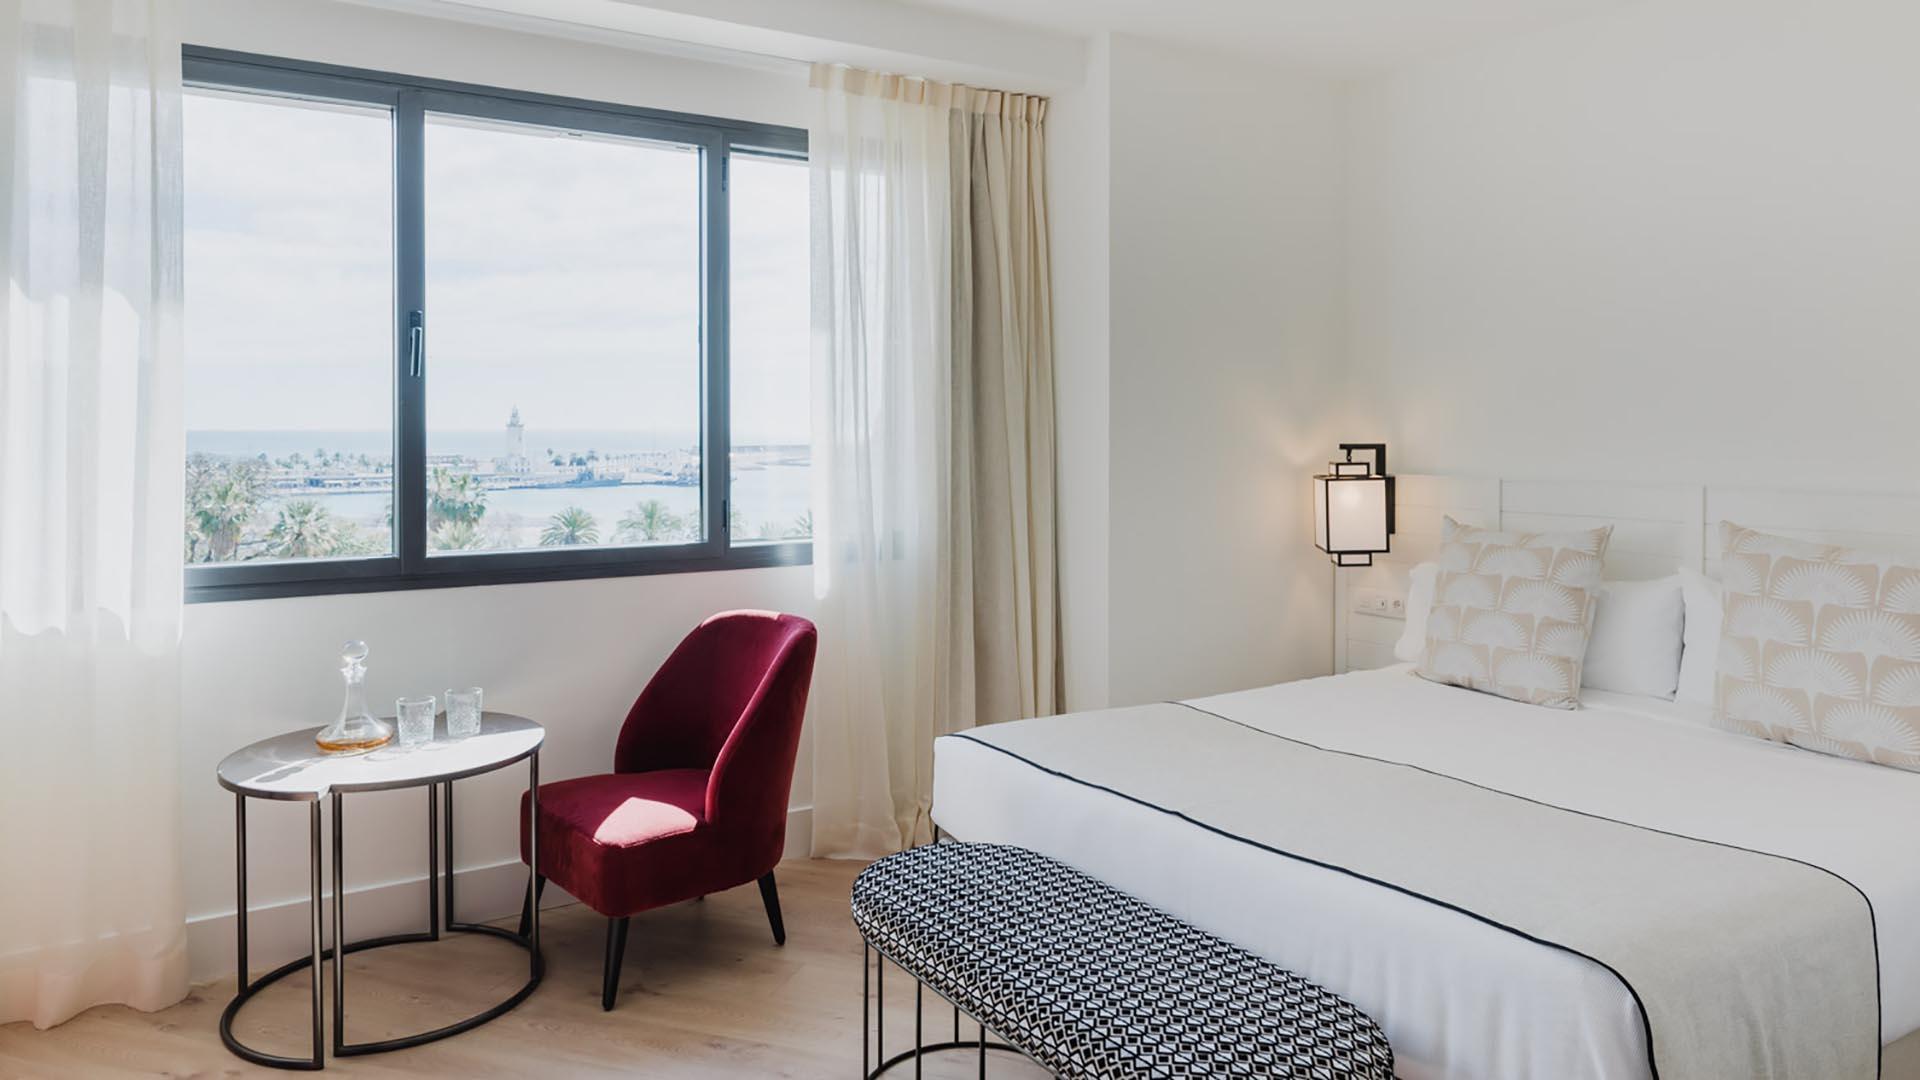 Deluxe Room at Hotel Molina Lario